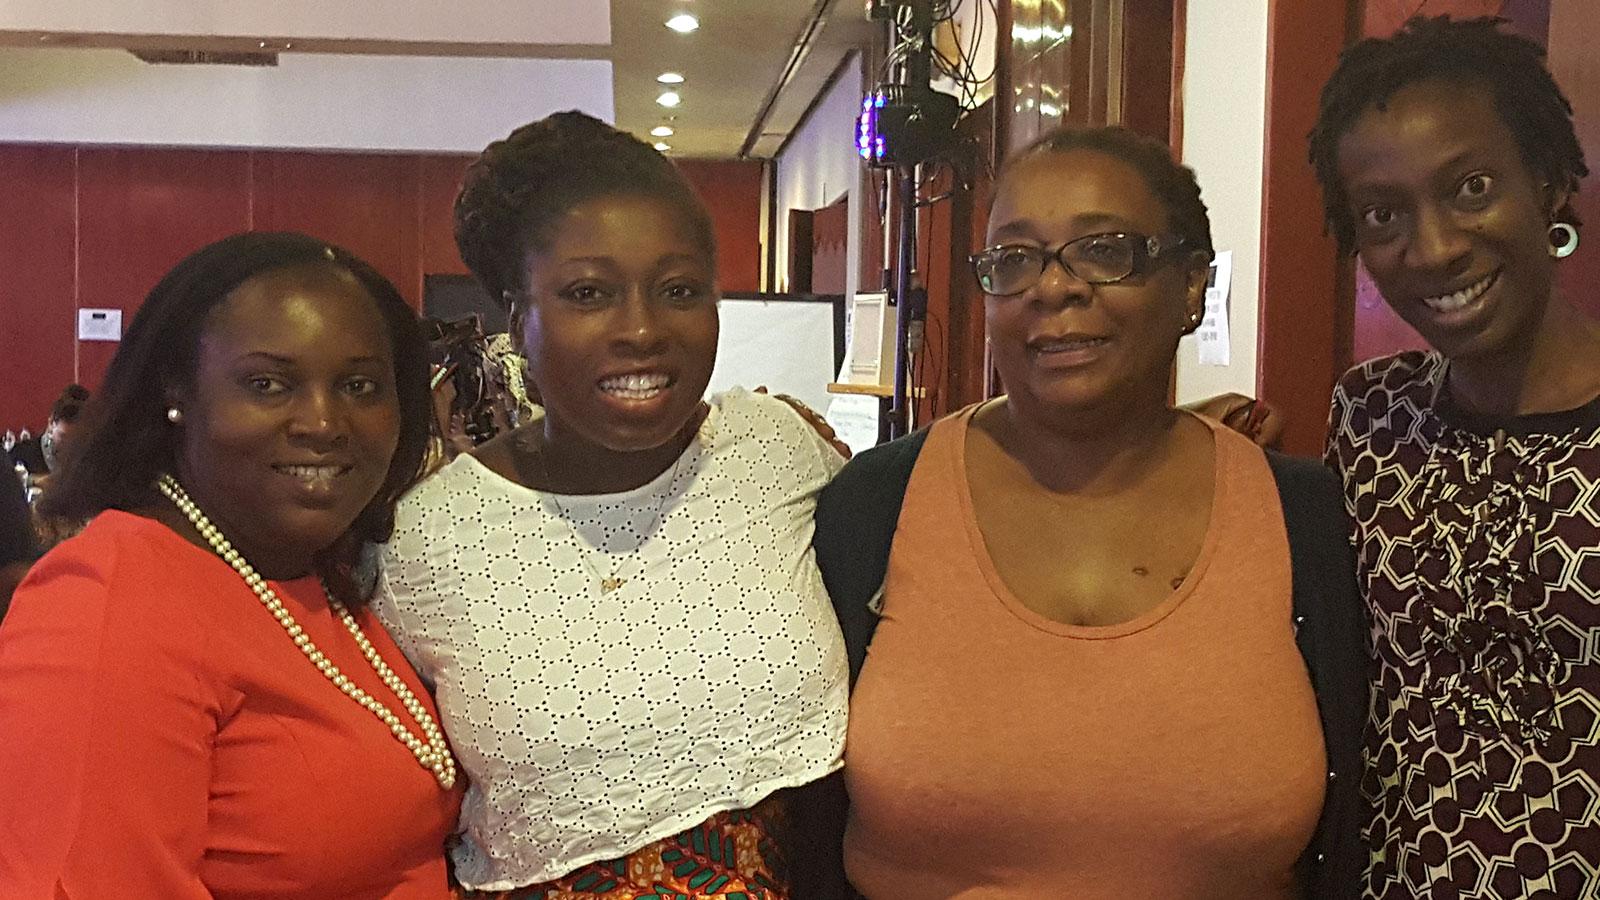 At the African Feminist Forum - By Nana Darkoa Sekyiamah (1600x900)